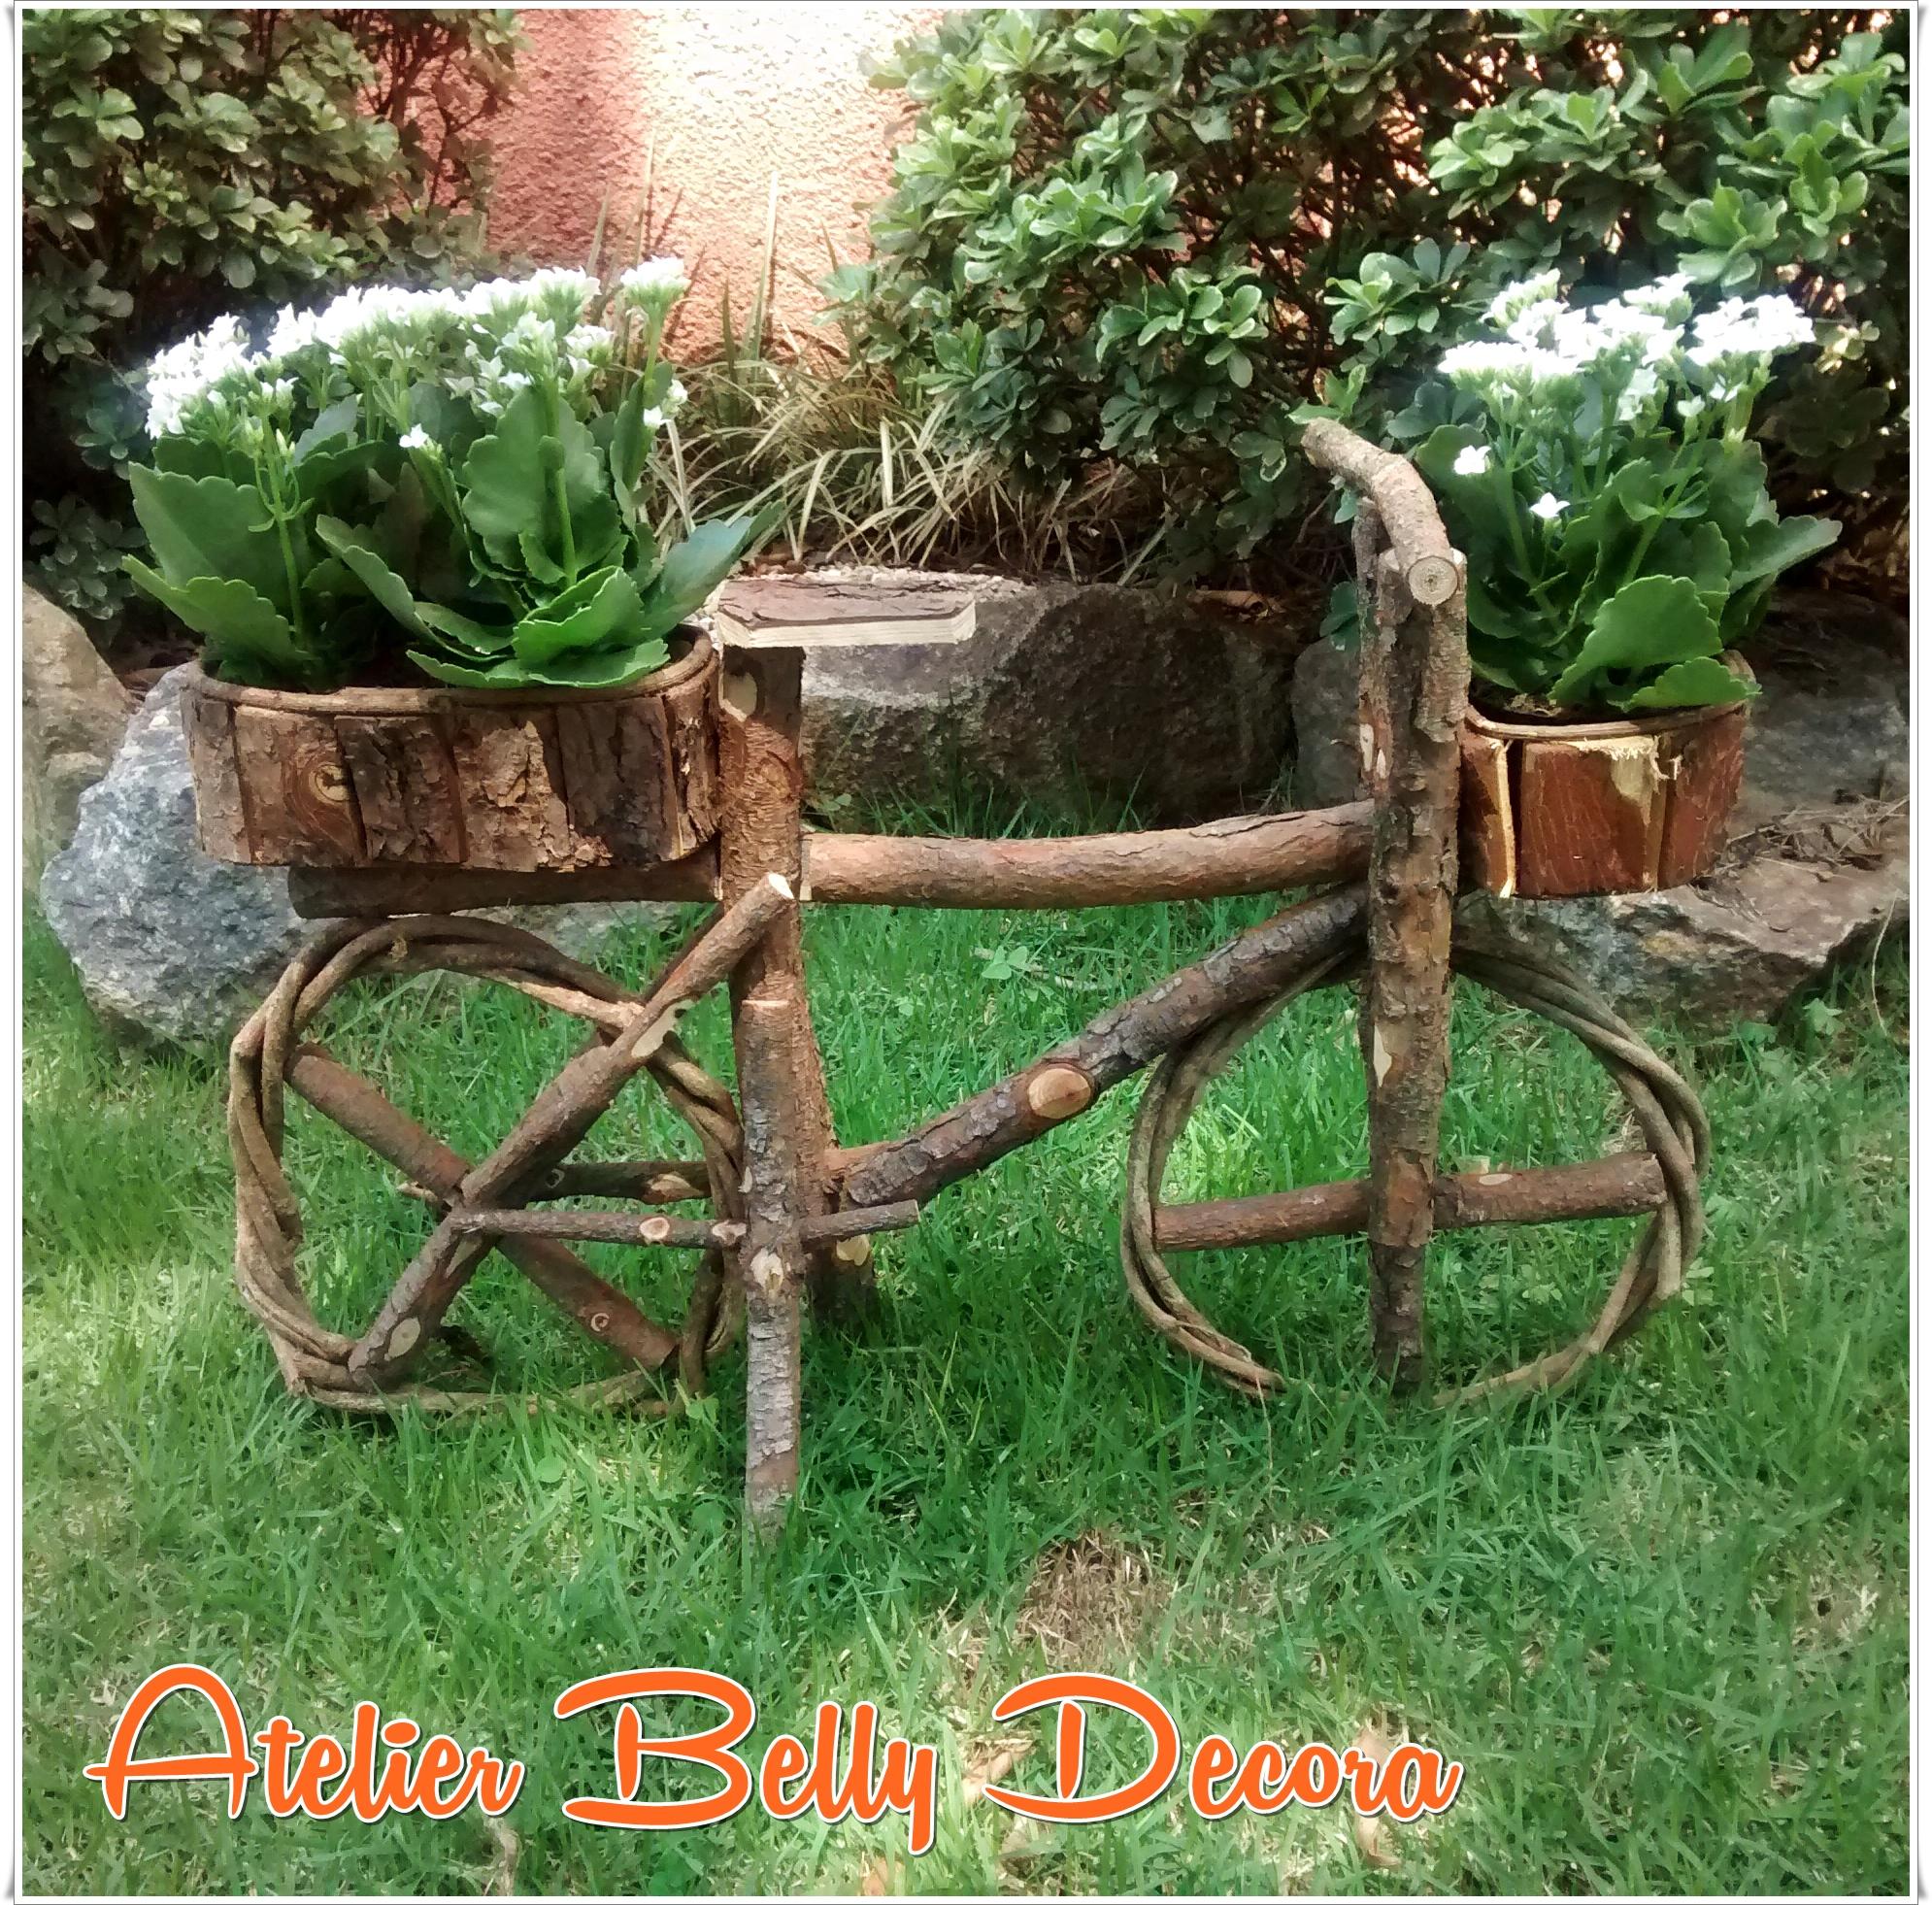 cipo jardim enfeite bicicleta c cachepo madeira cipo jardim decoracao  #CA4201 1990x1962